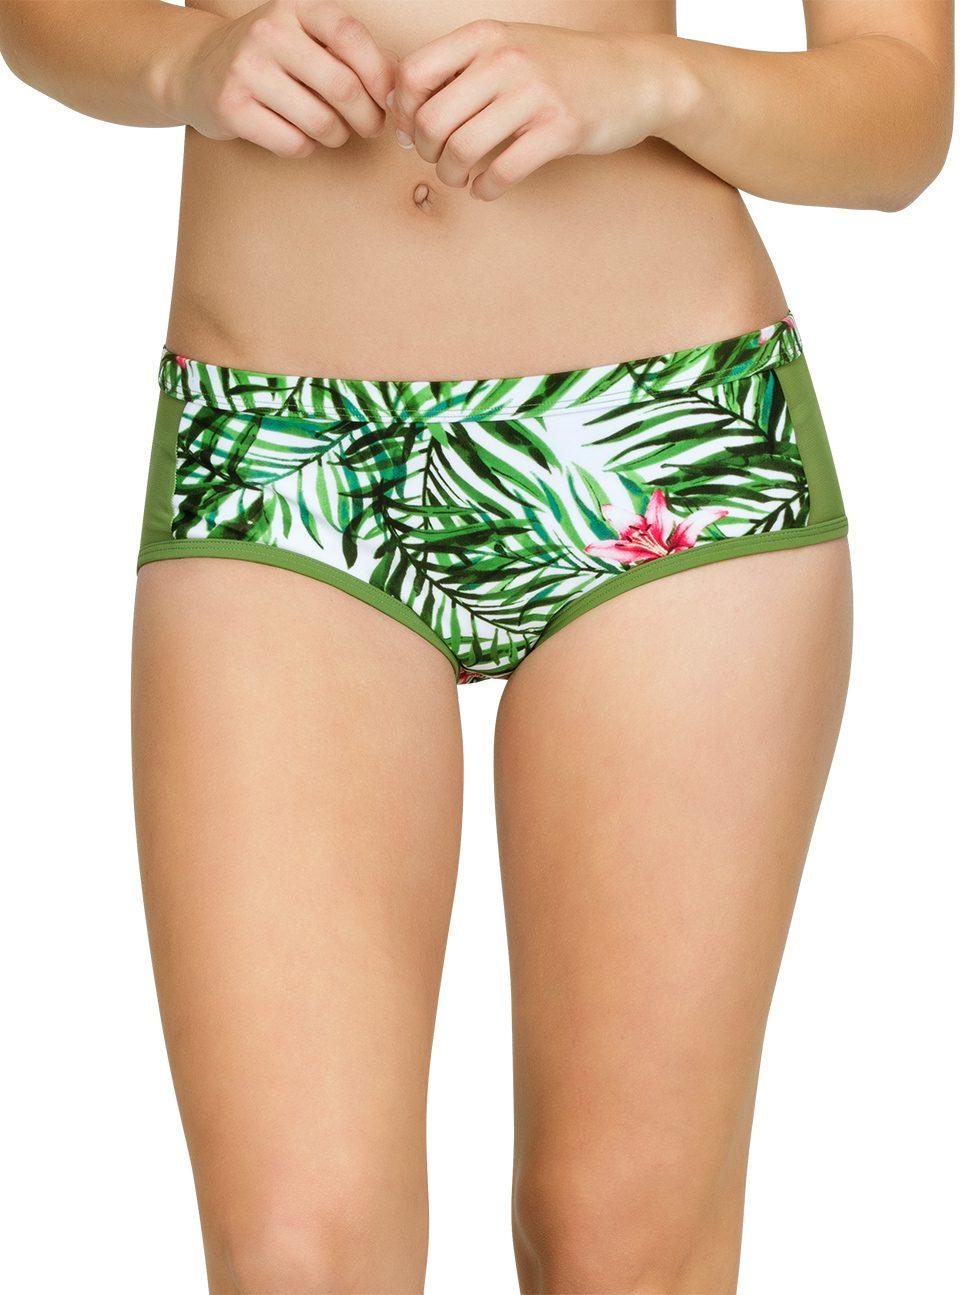 MODBYPARFAIT_Passion_BikiniBottomS8104_TropicalPrint_Front